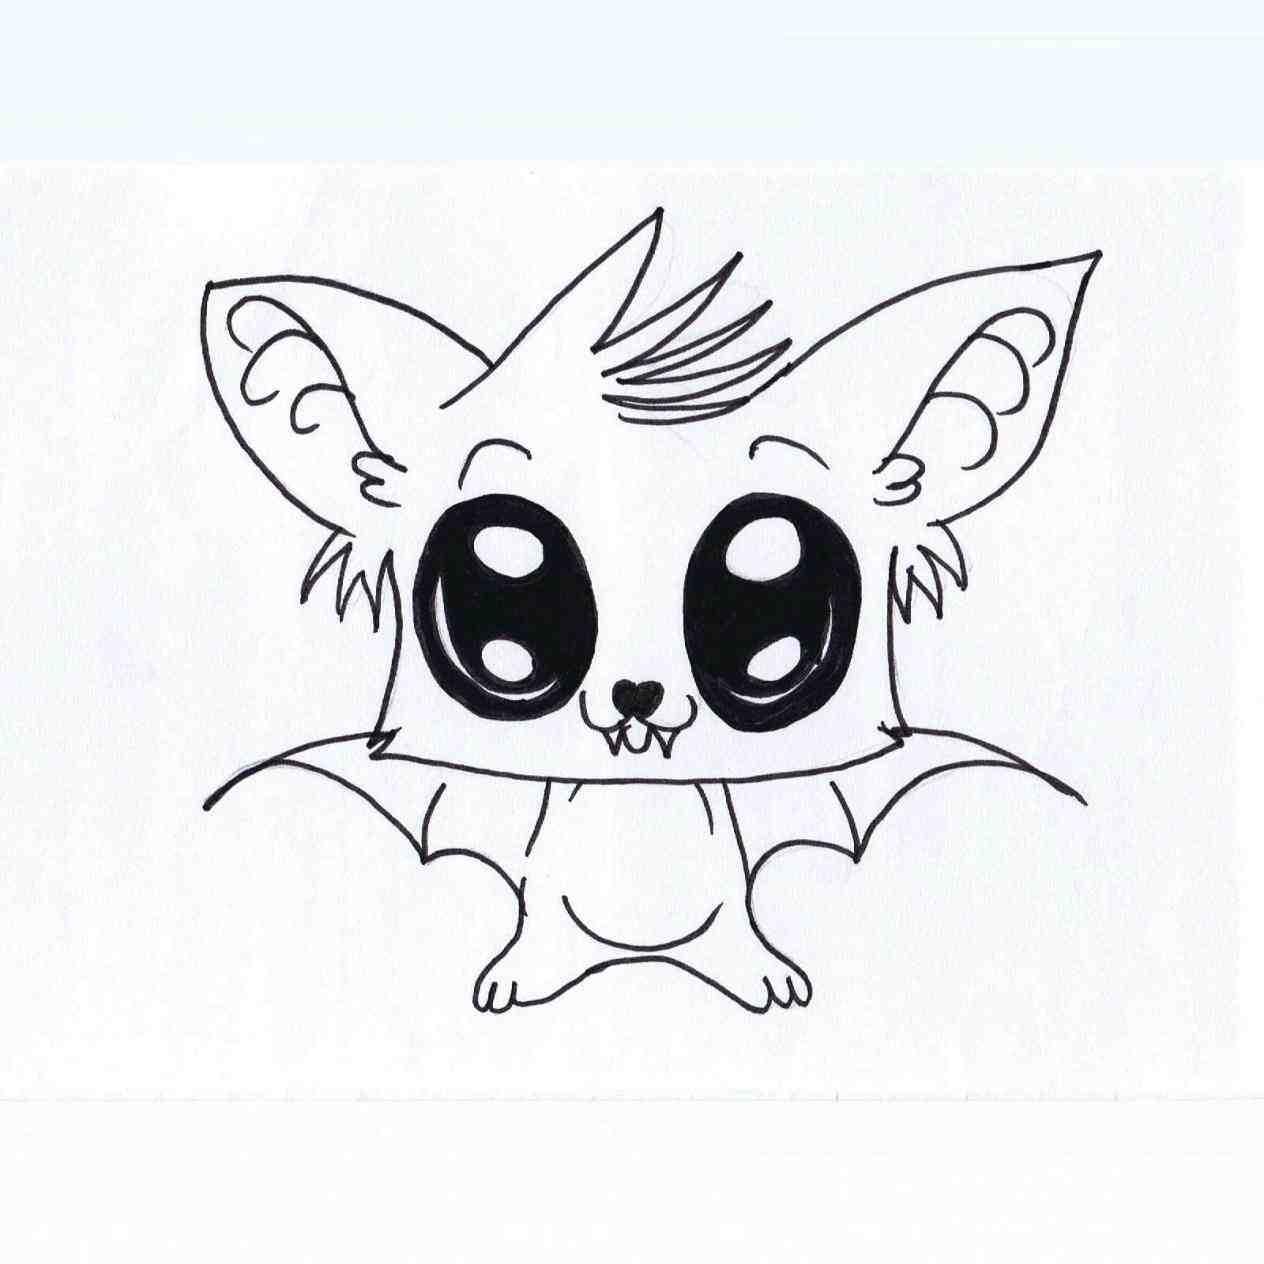 1264x1264 Cute Chibi Animals Google Search Etsy Chibi Google